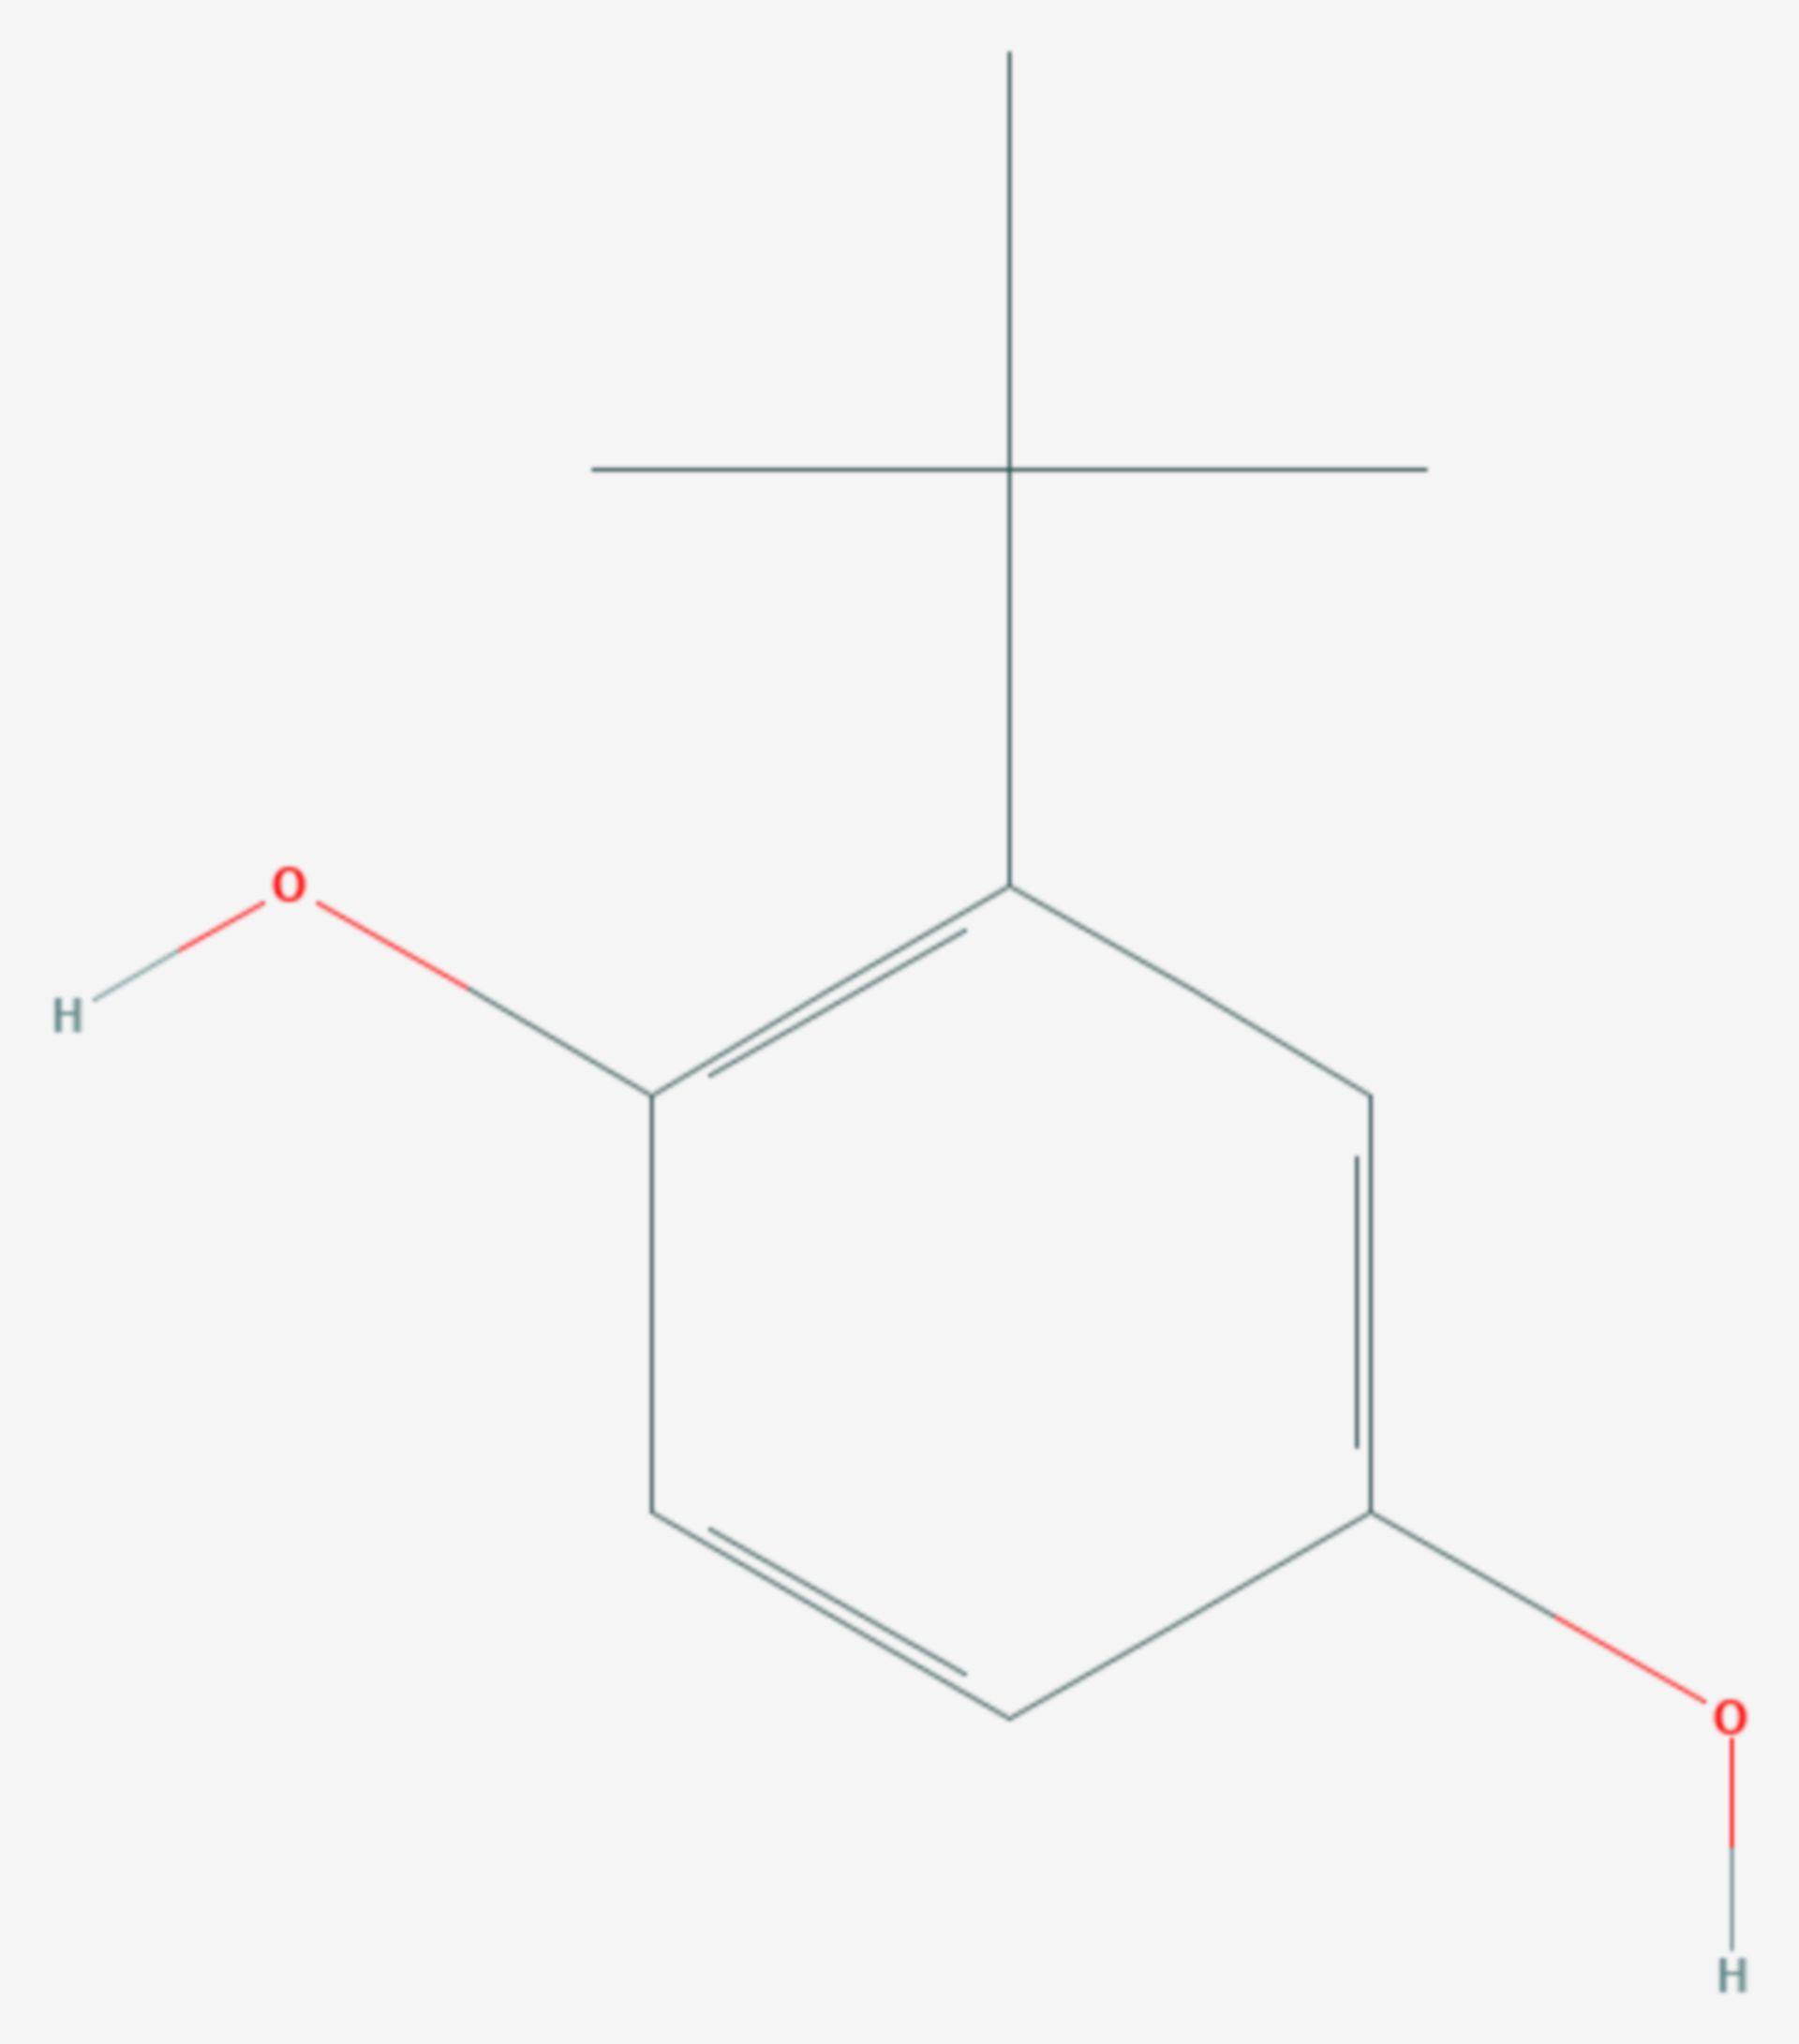 2-tert-Butylhydrochinon (Strukturformel)